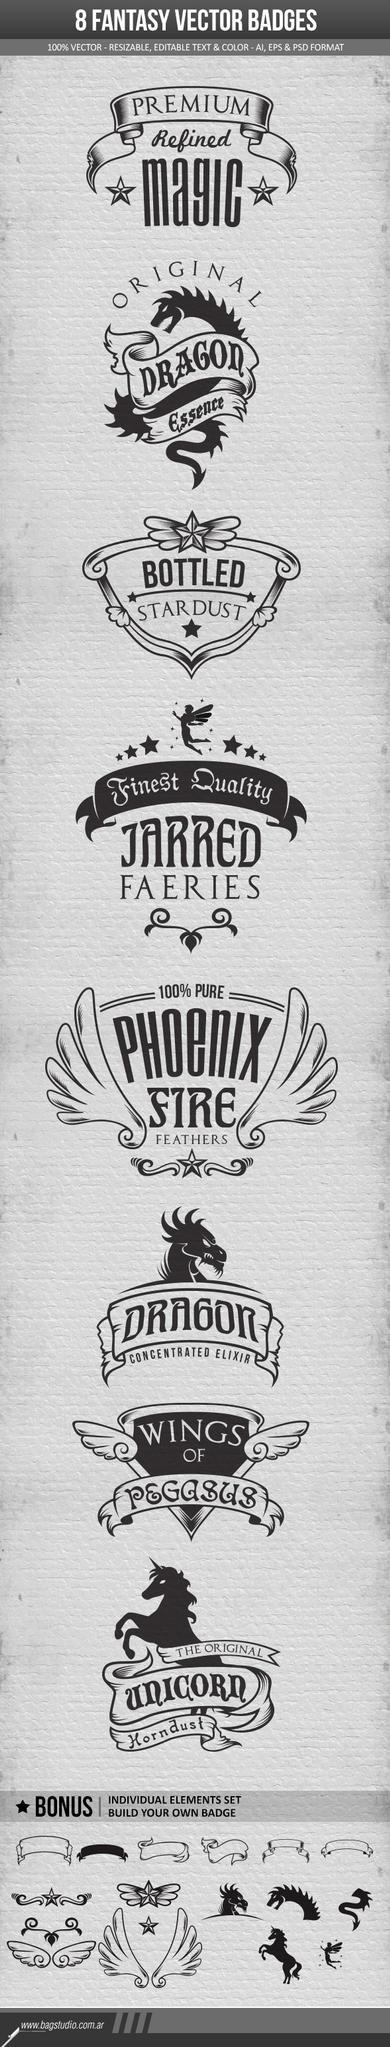 Fantasy Badges Pack by MrGabey